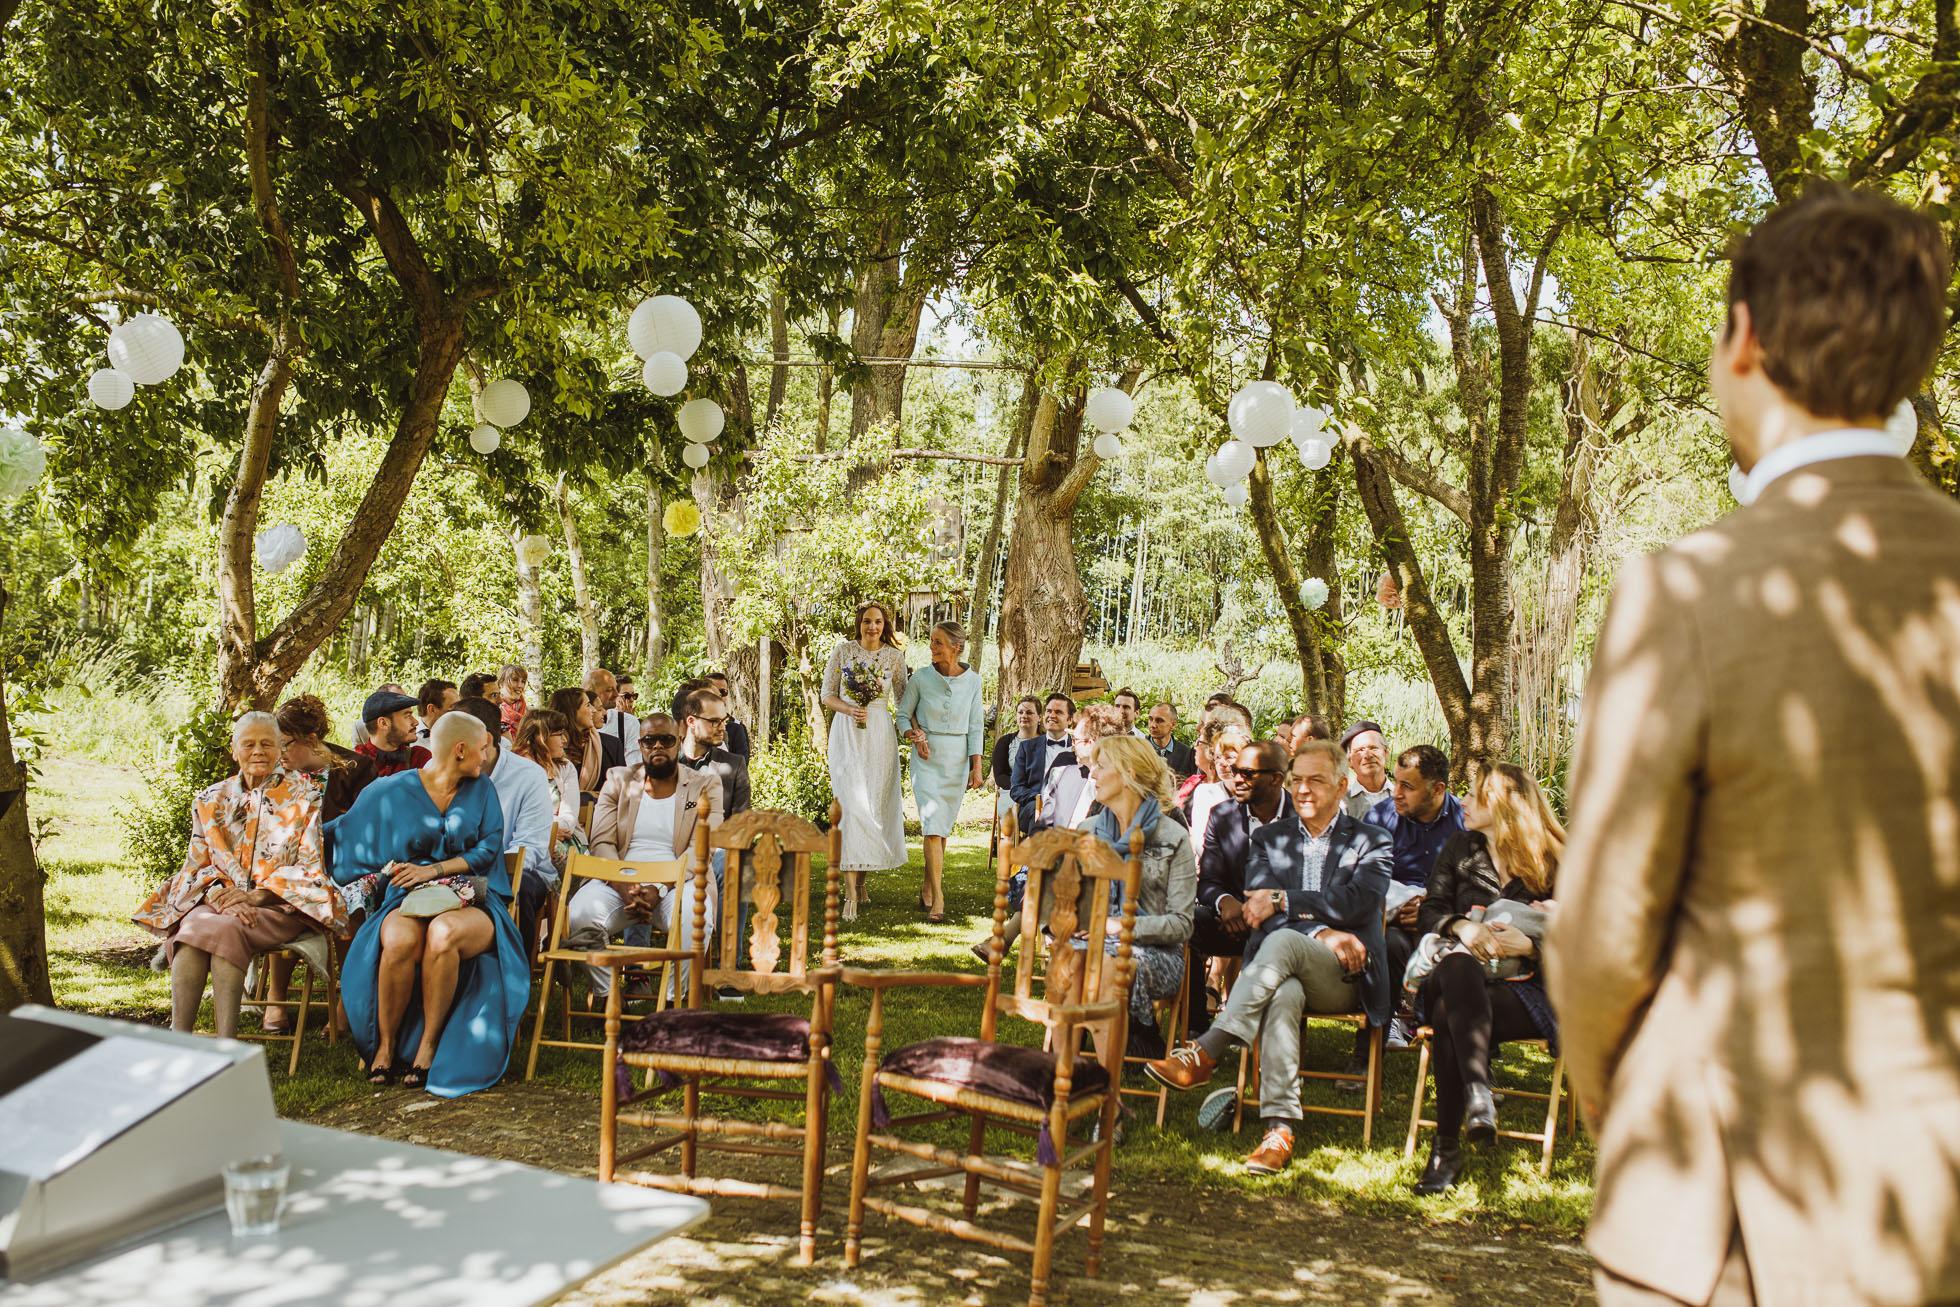 utrecht-wedding-photographer-65.jpg